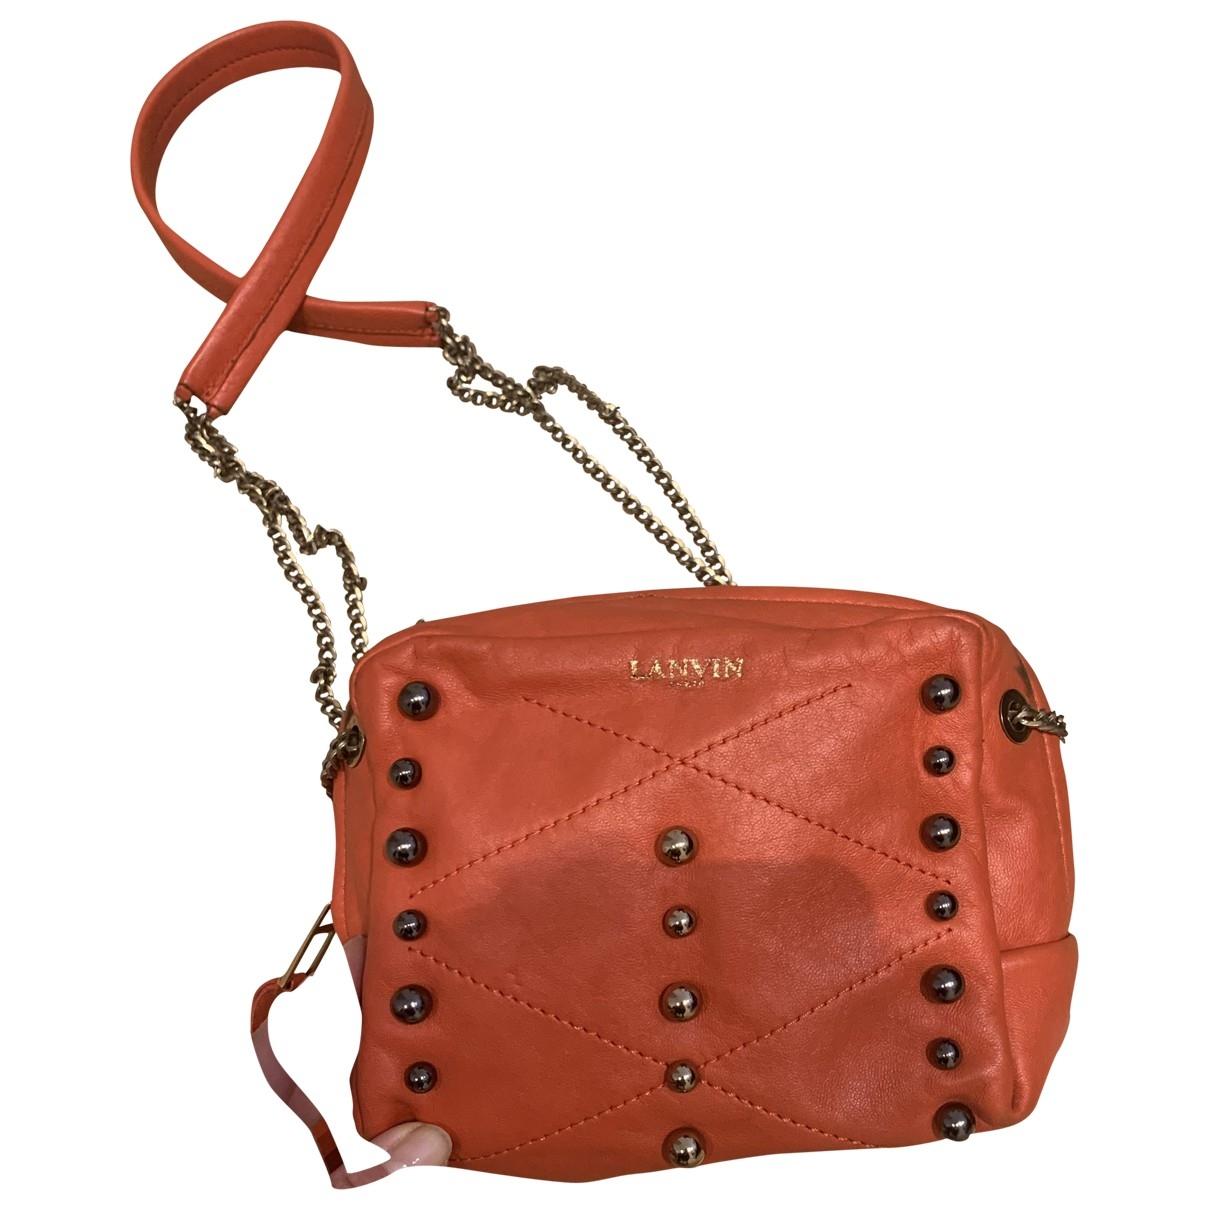 Lanvin \N Orange Leather handbag for Women \N